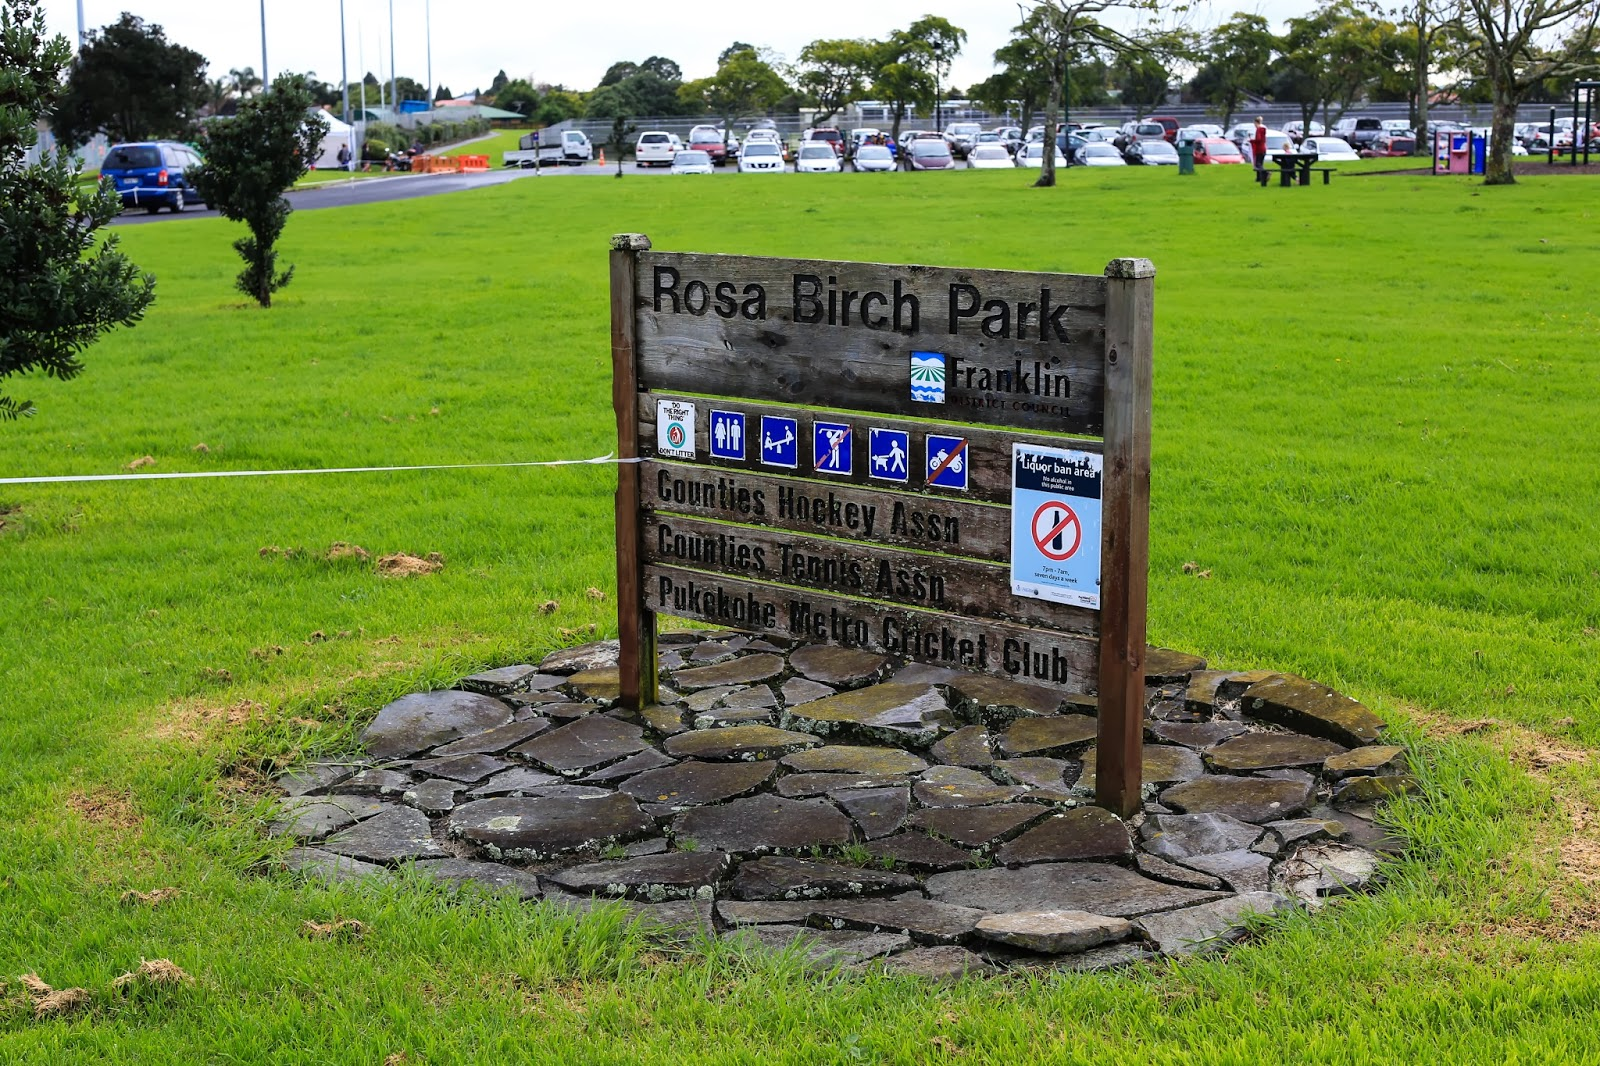 Rosa Birch Park